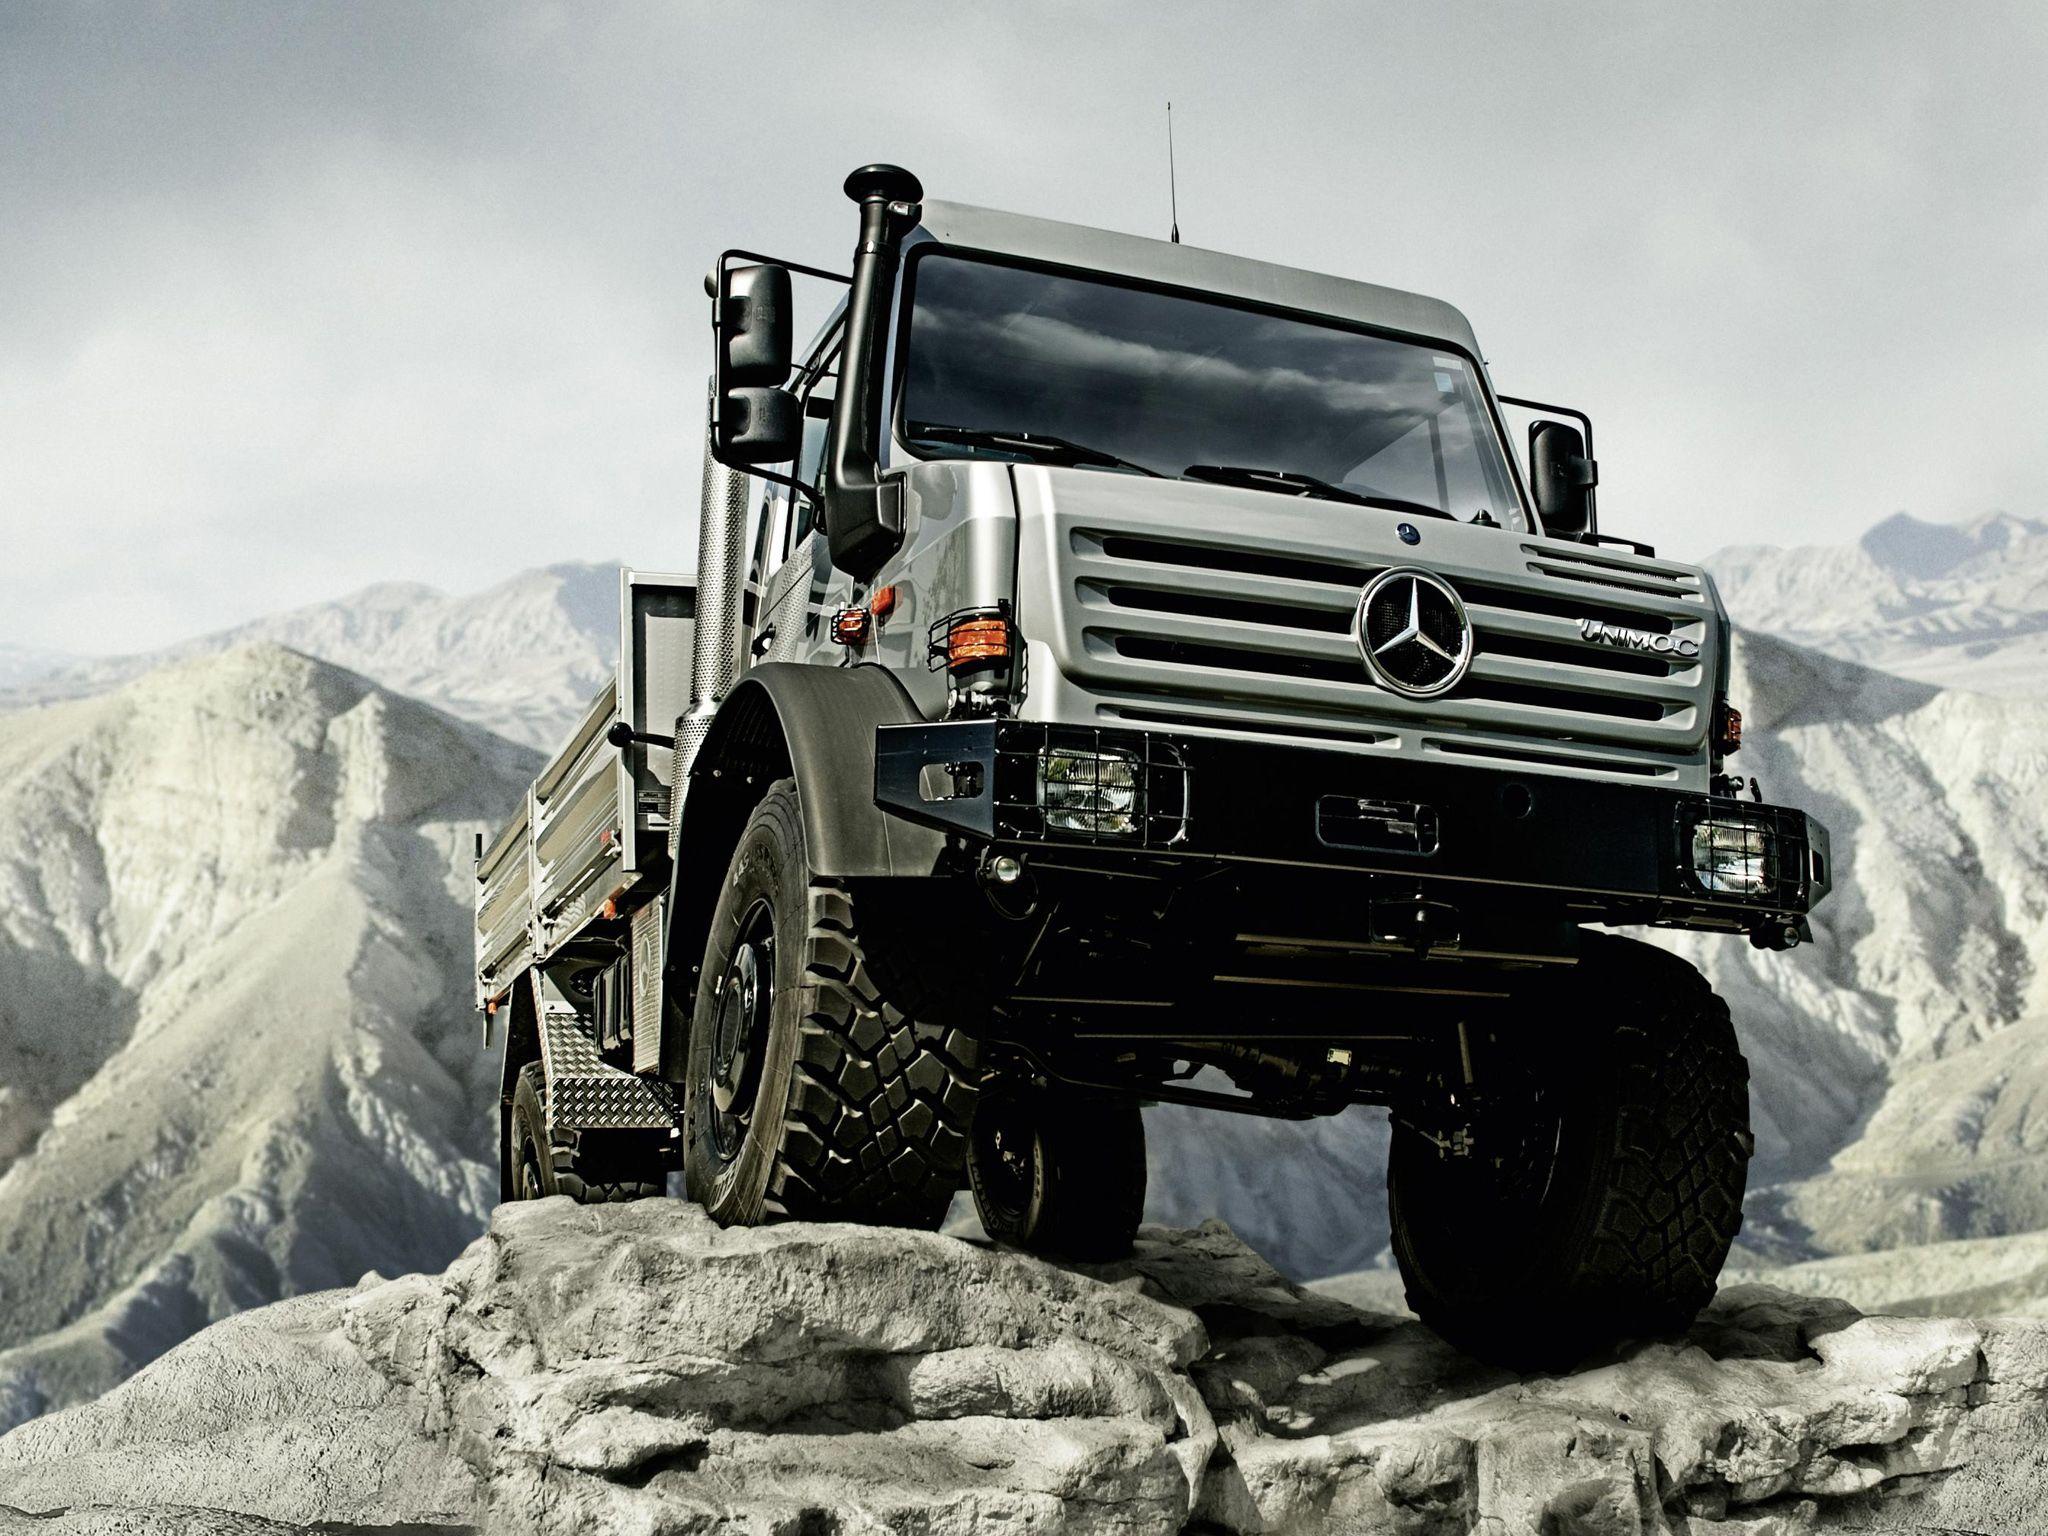 Best 25 unimog u5000 ideas on pinterest mercedes benz for Mercedes benz unimog for sale usa